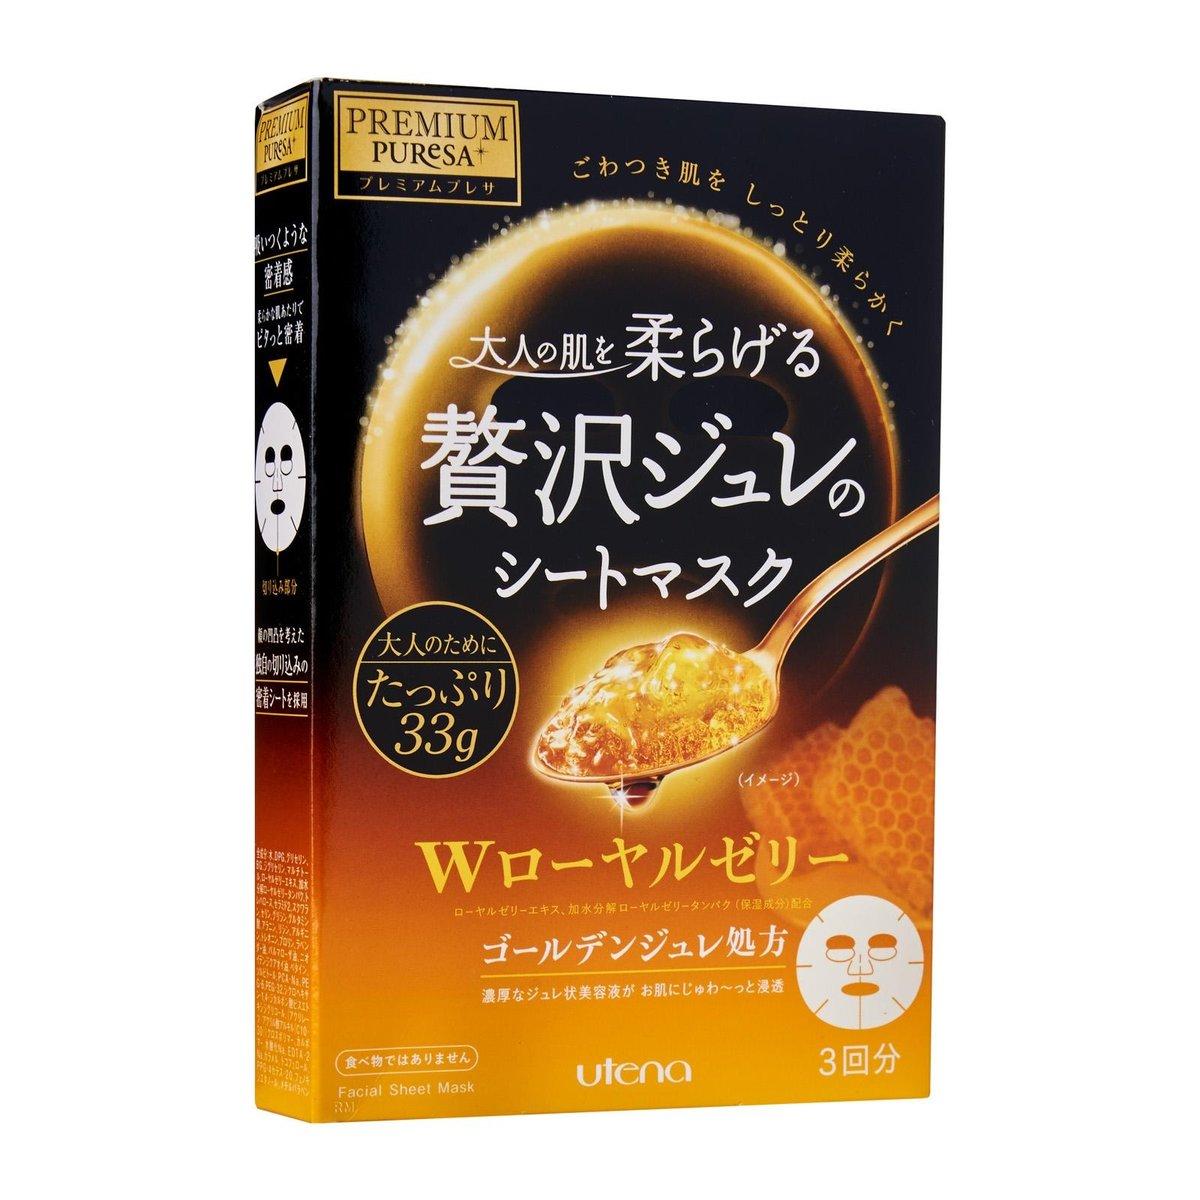 Utena - 日本 佑天蘭 Utena Premium Puresa 黃金啫喱面膜(蜂王漿)(黃色)3片裝